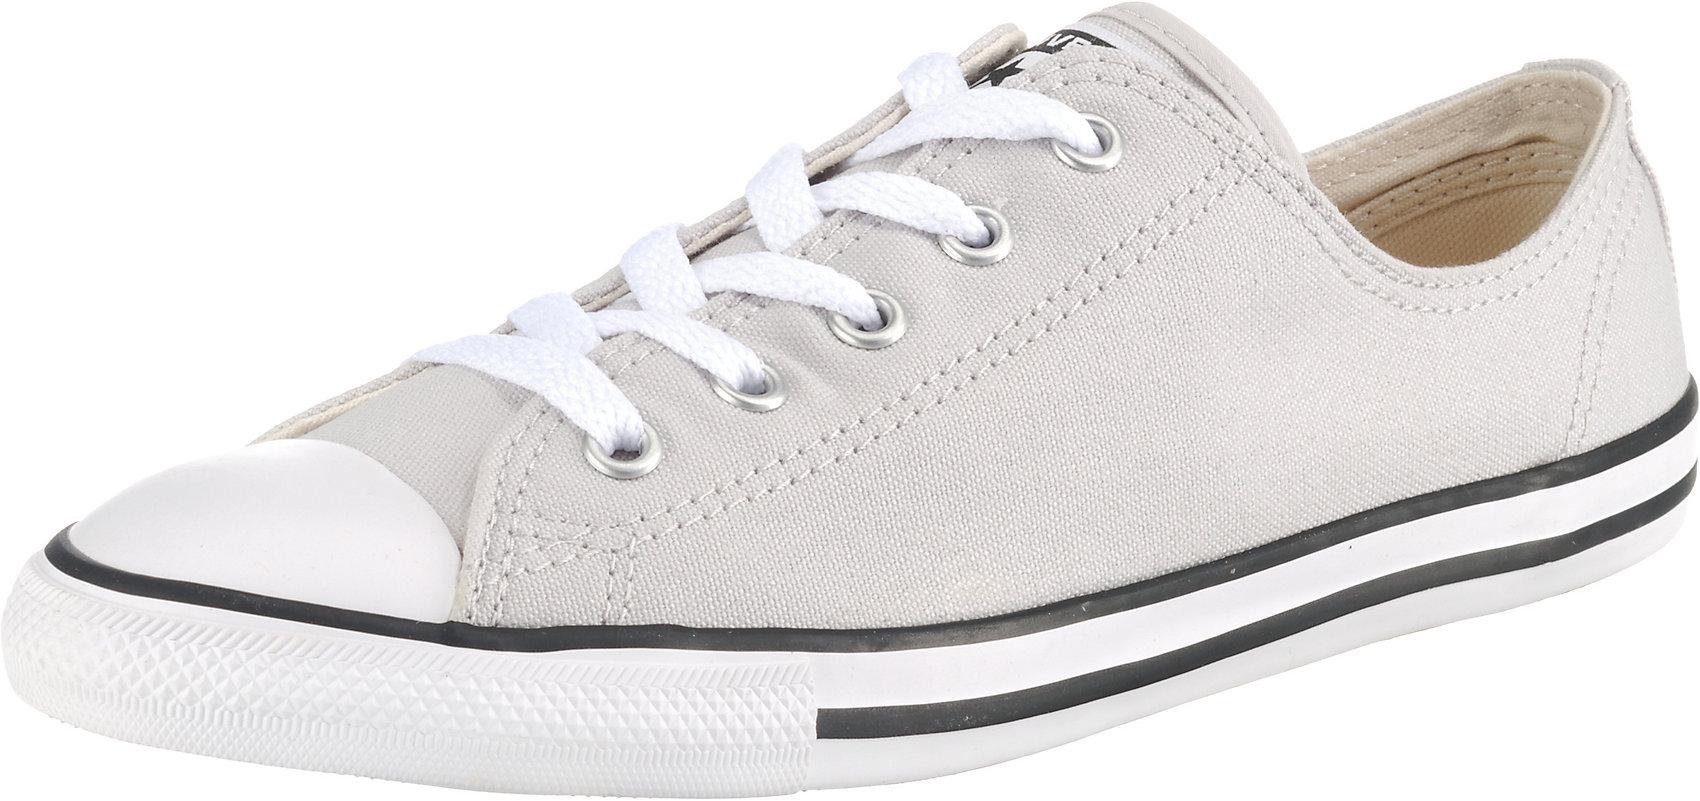 Details zu Neu CONVERSE Chuck Taylor All Star Dainty Ox Sneakers Low 10593689 für Damen